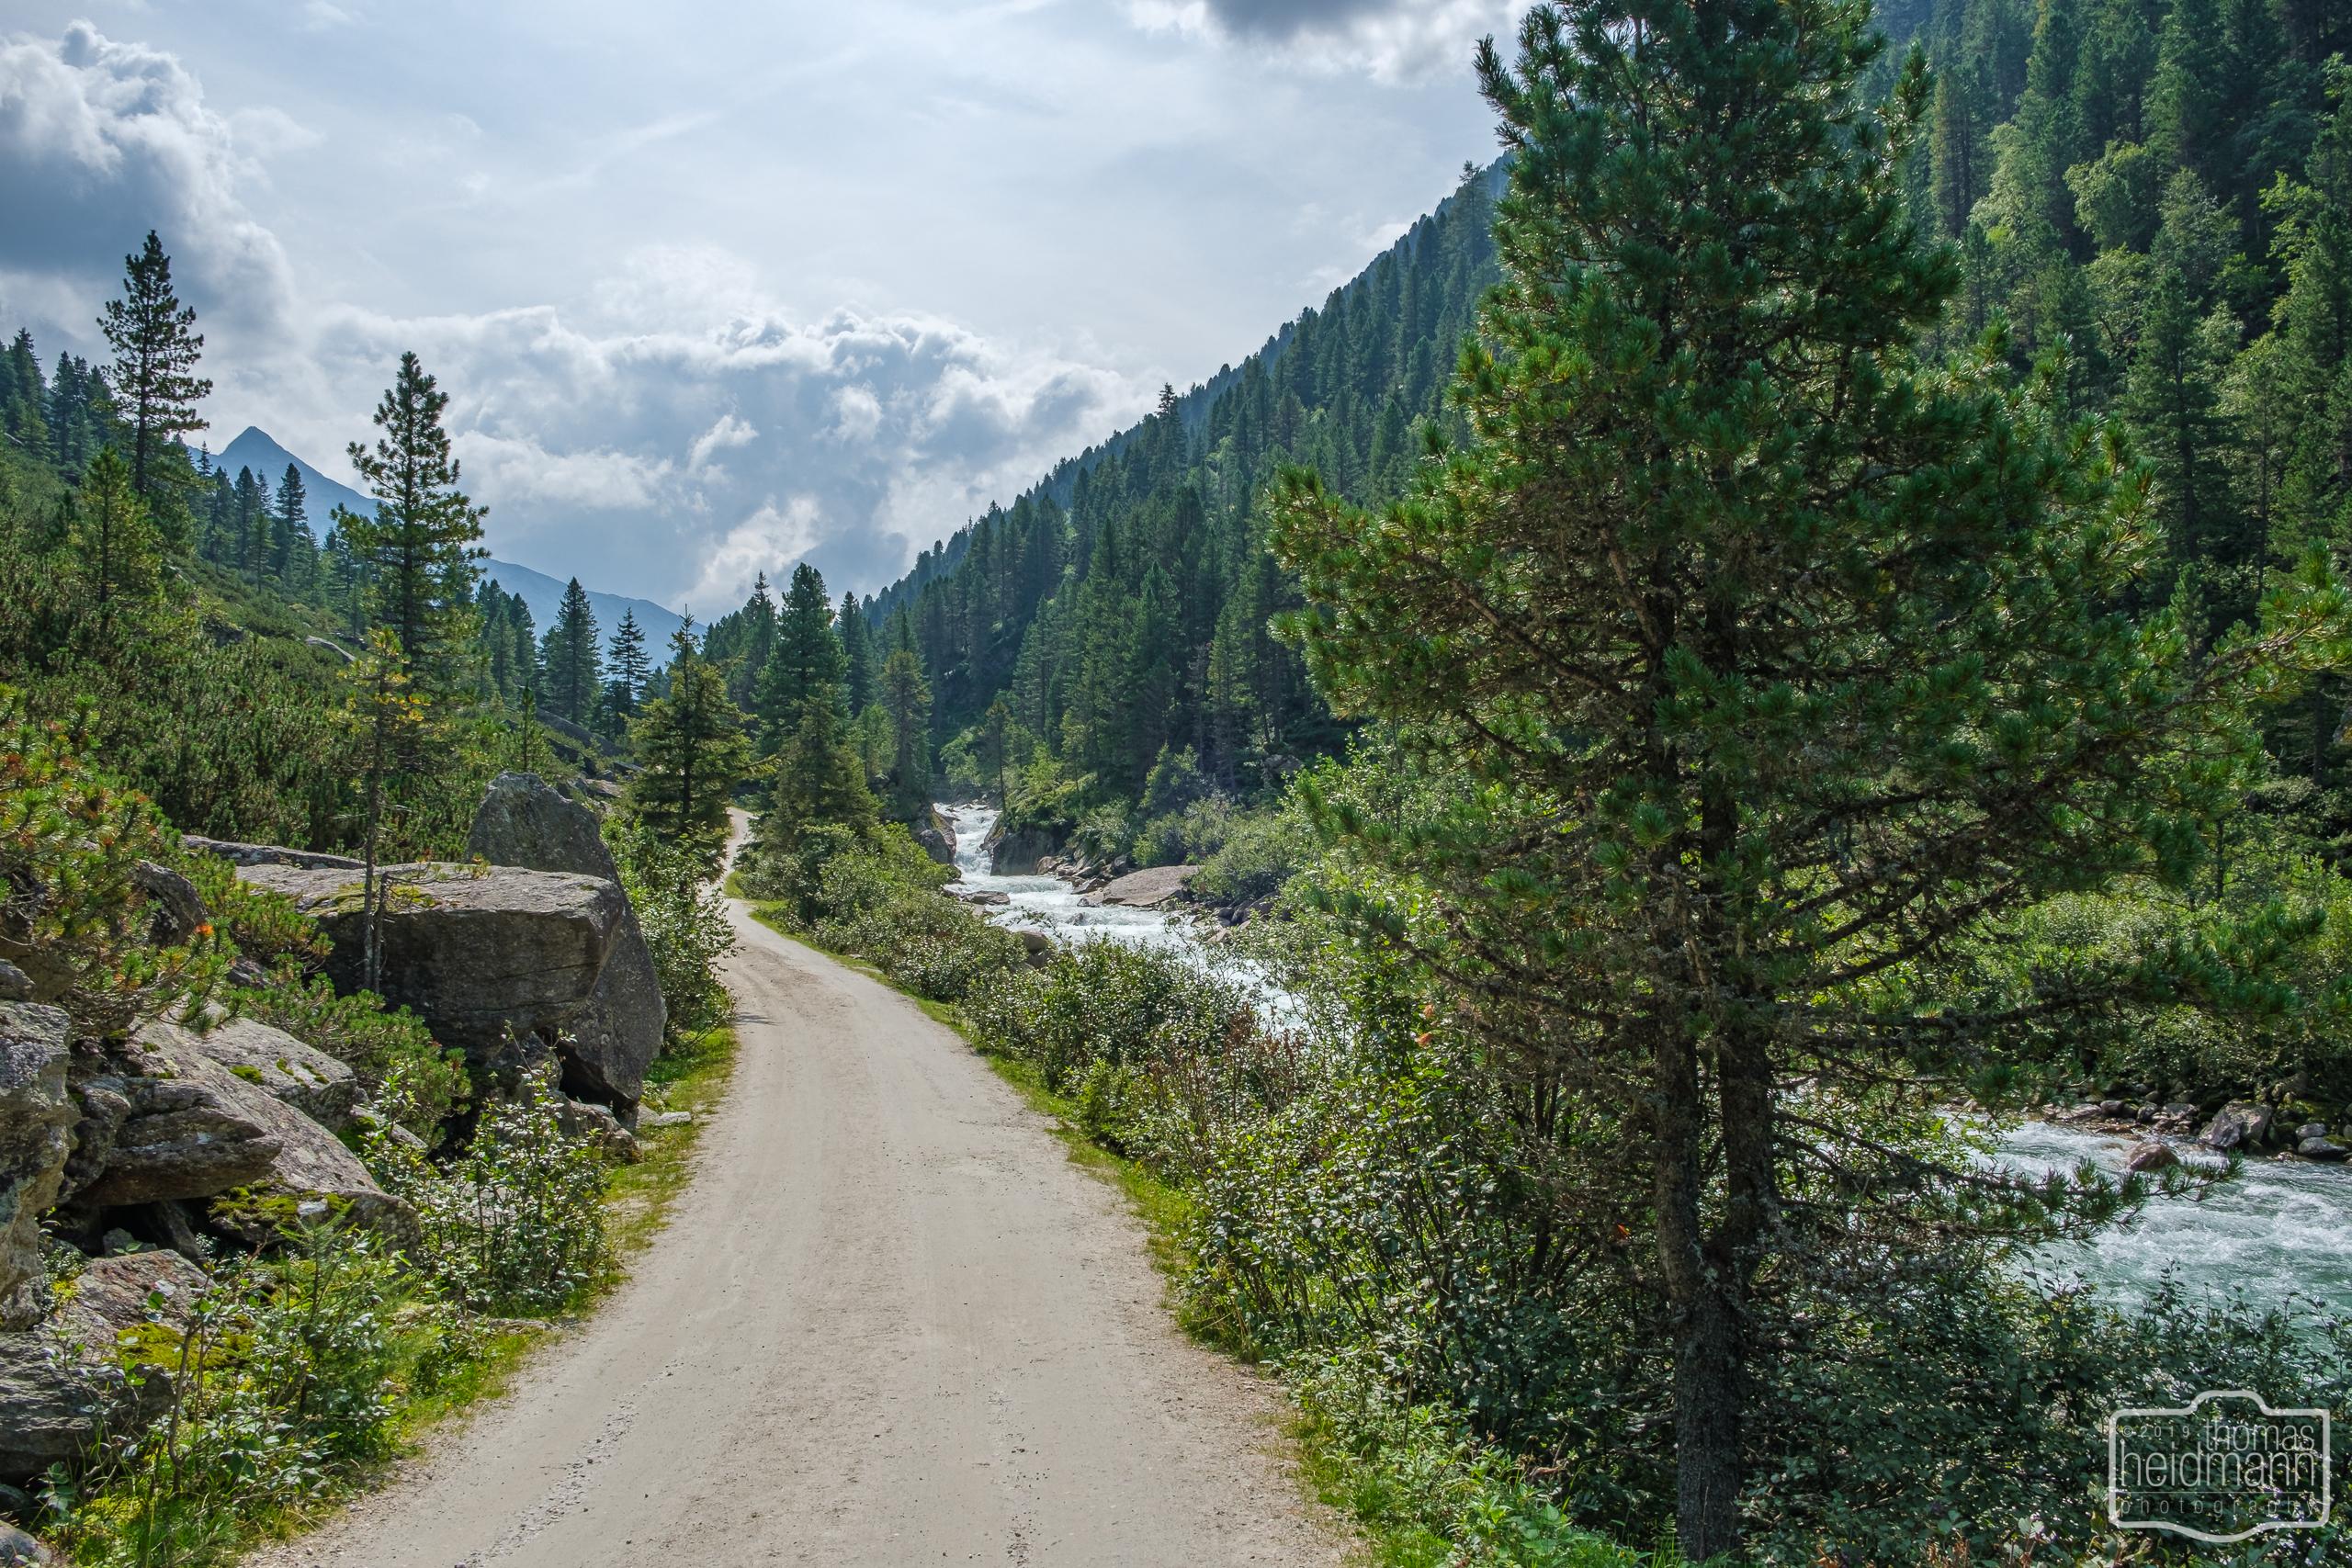 Radtour durchs Krimmler Achental - Der Weg führt am Gebirgsbach entlang